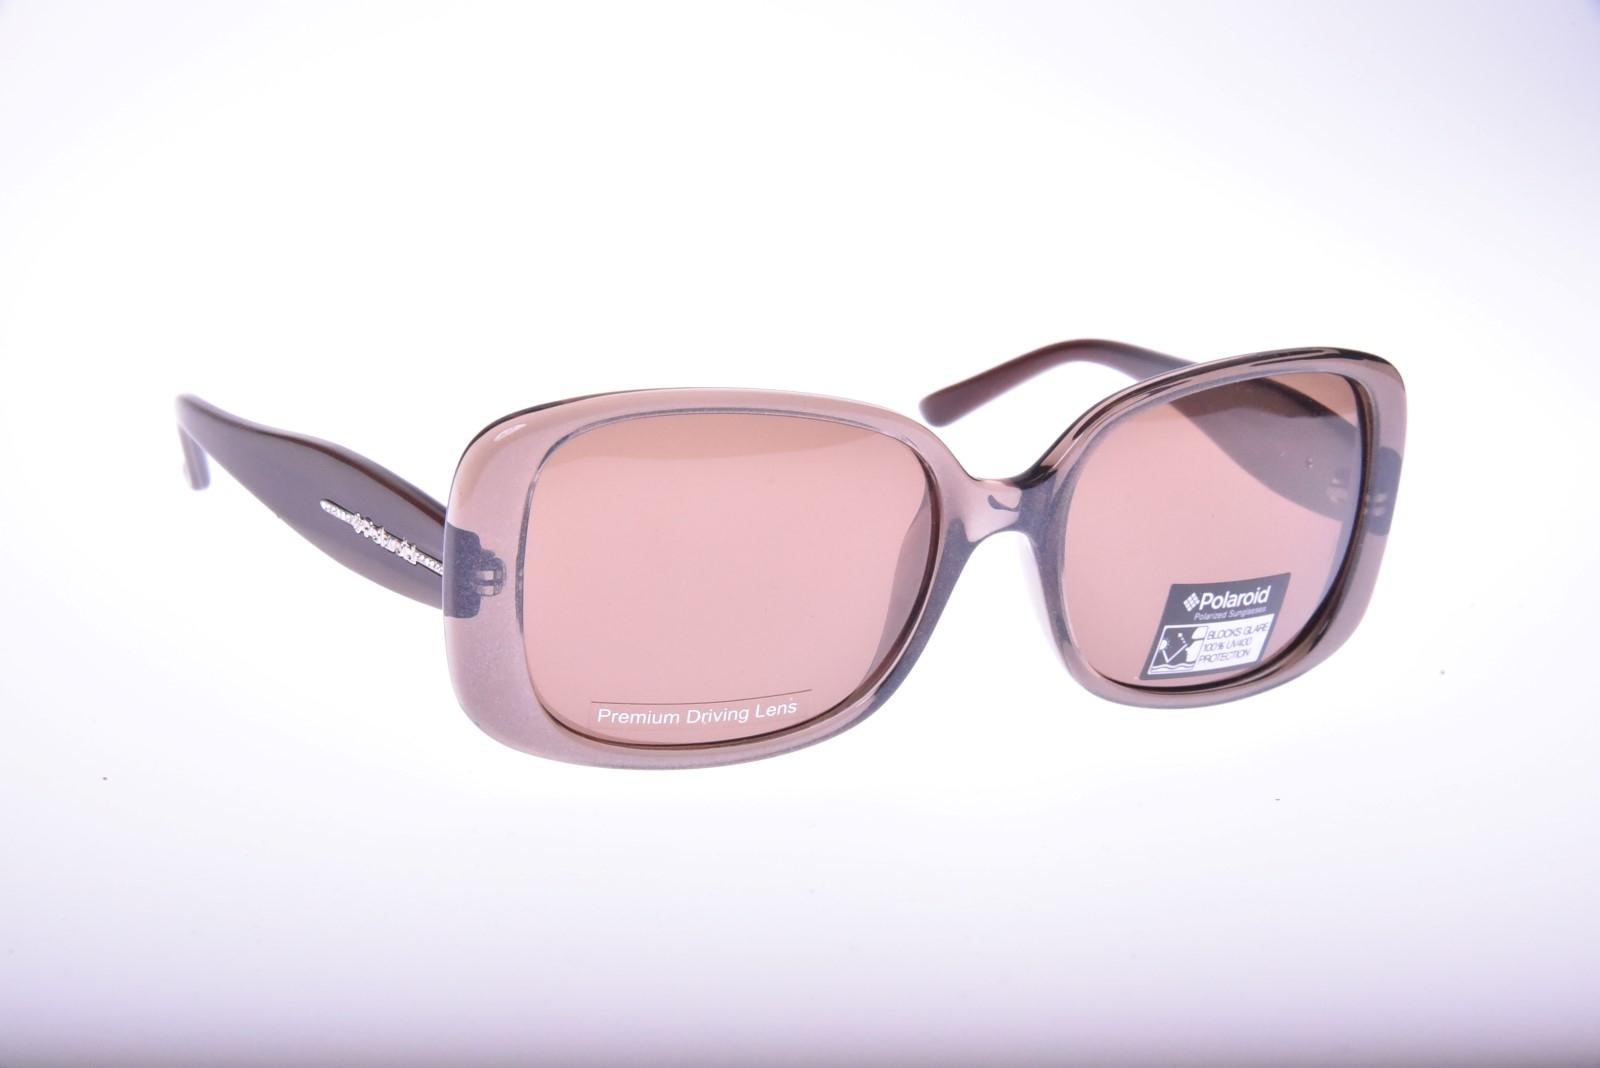 Polaroid Superior F8010C - Dámske slnečné okuliare